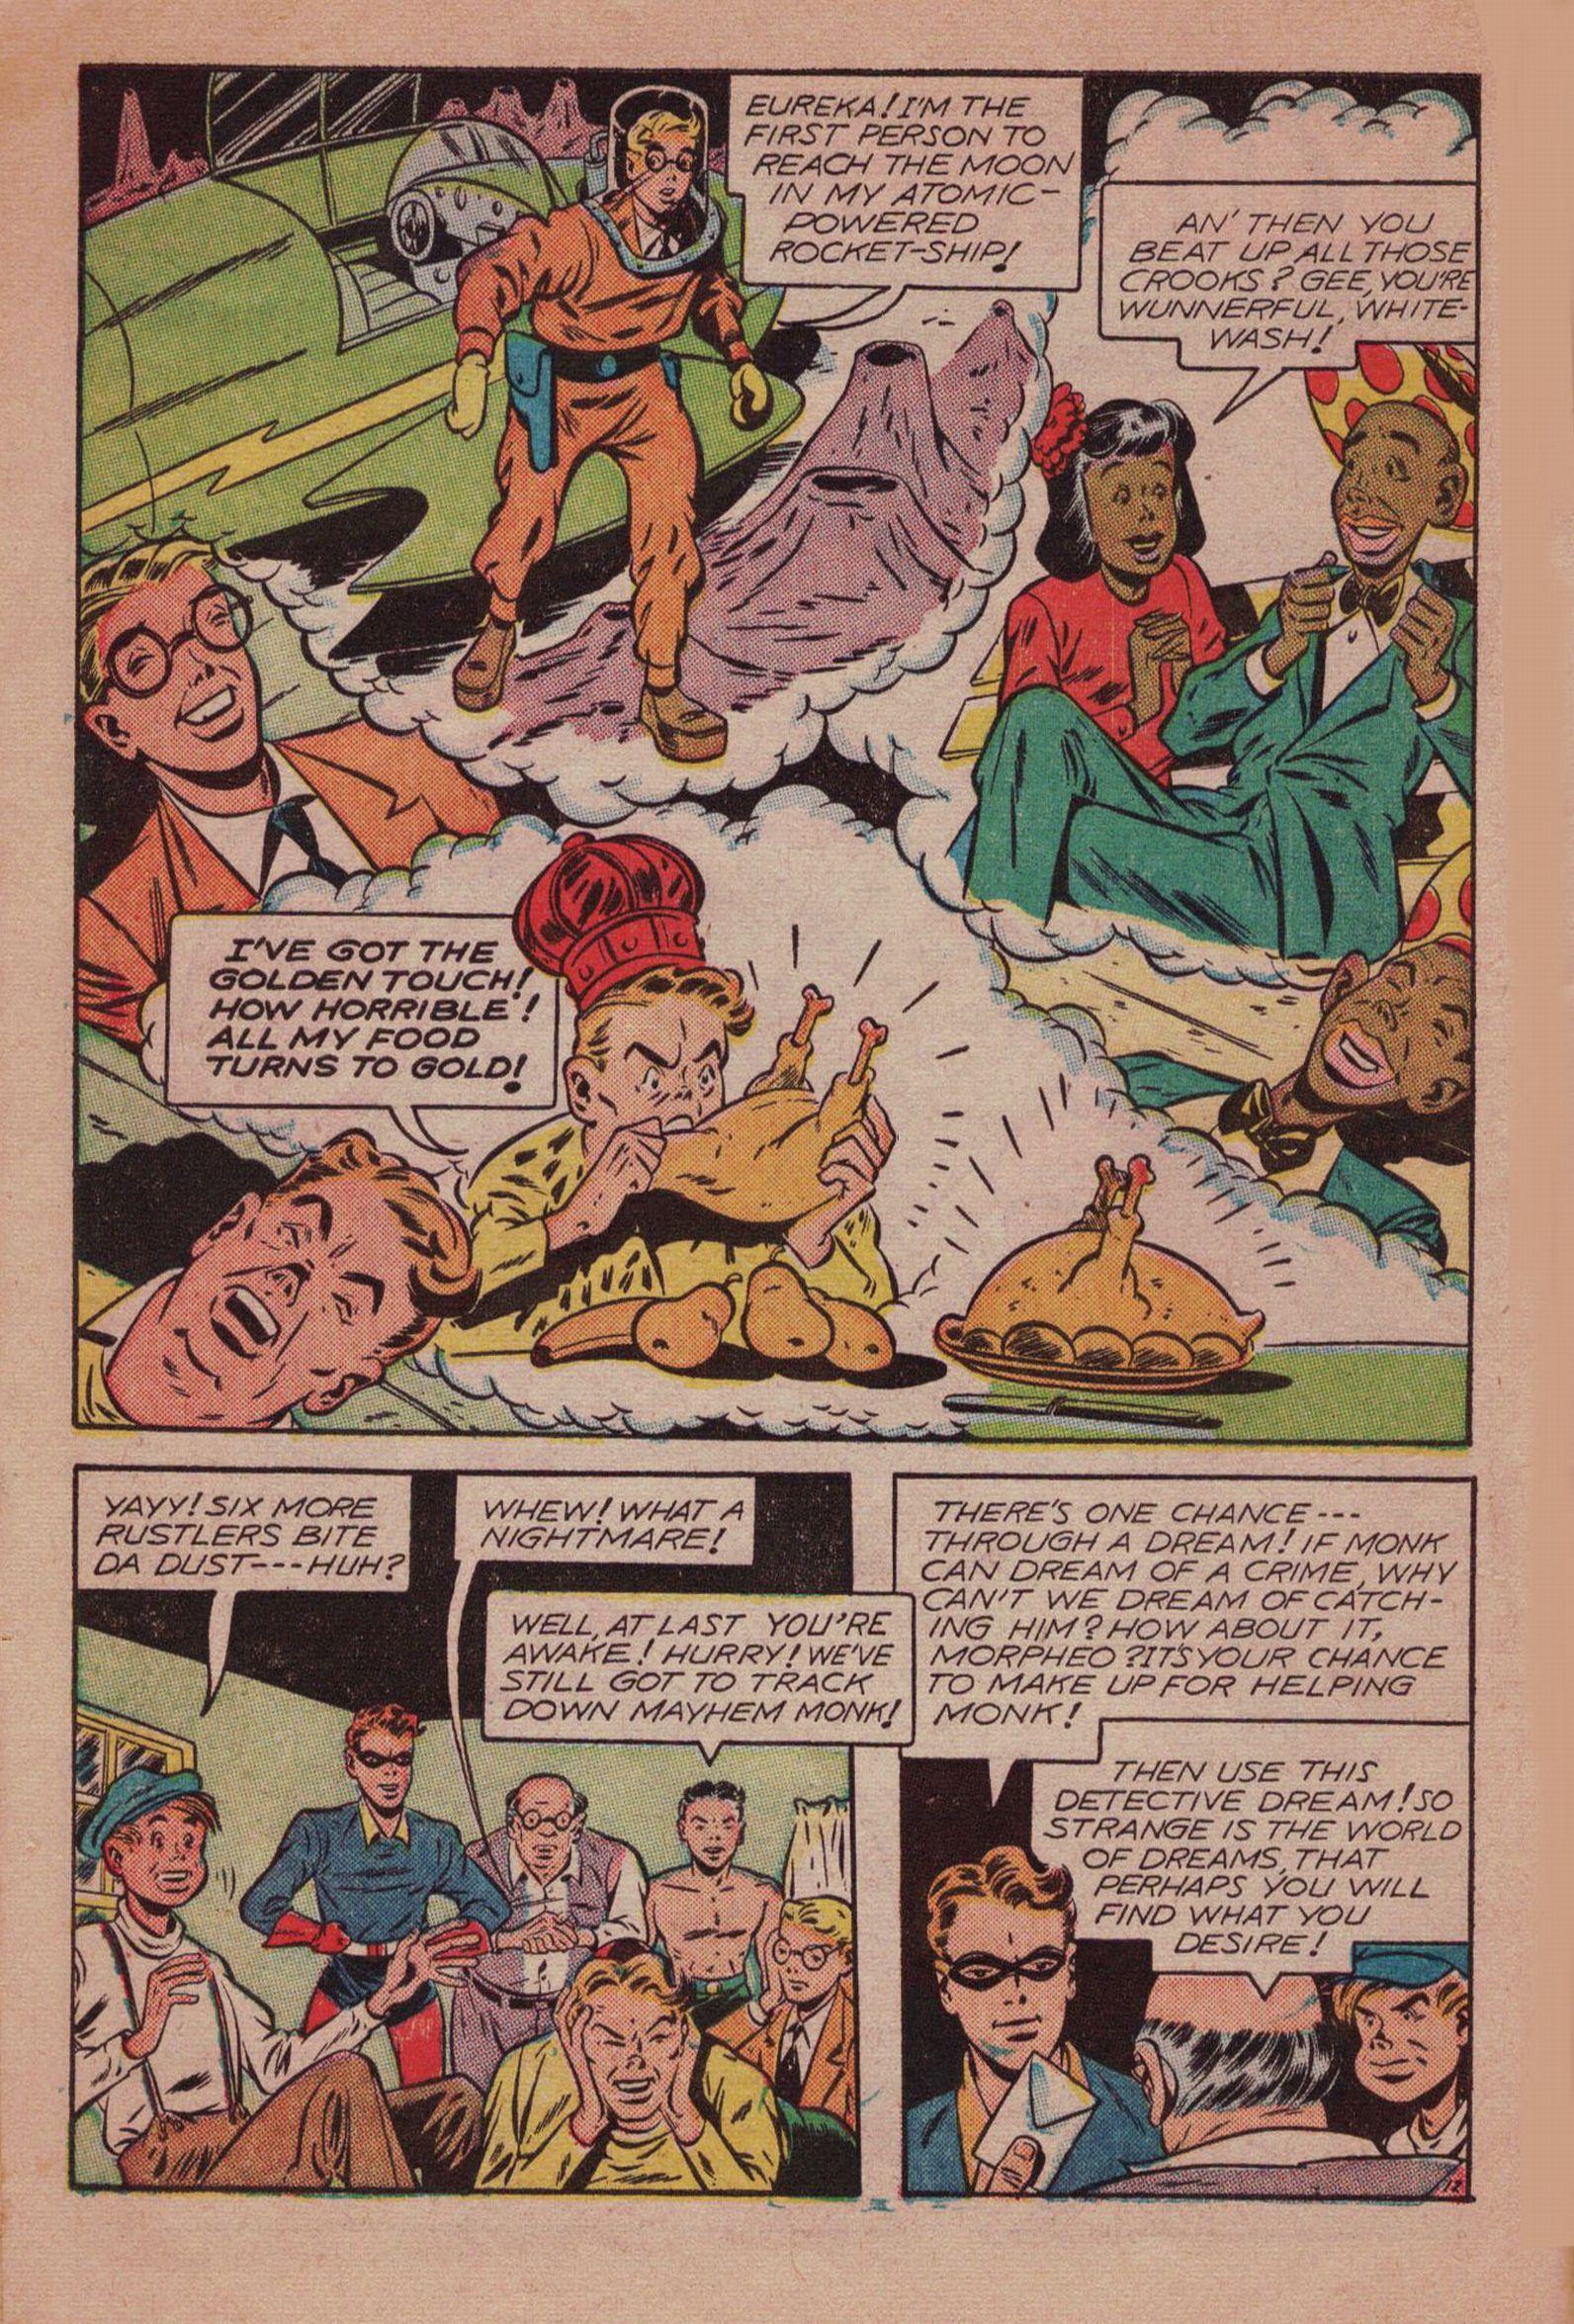 Young Allies Comics Issue 20 | Viewcomic reading comics